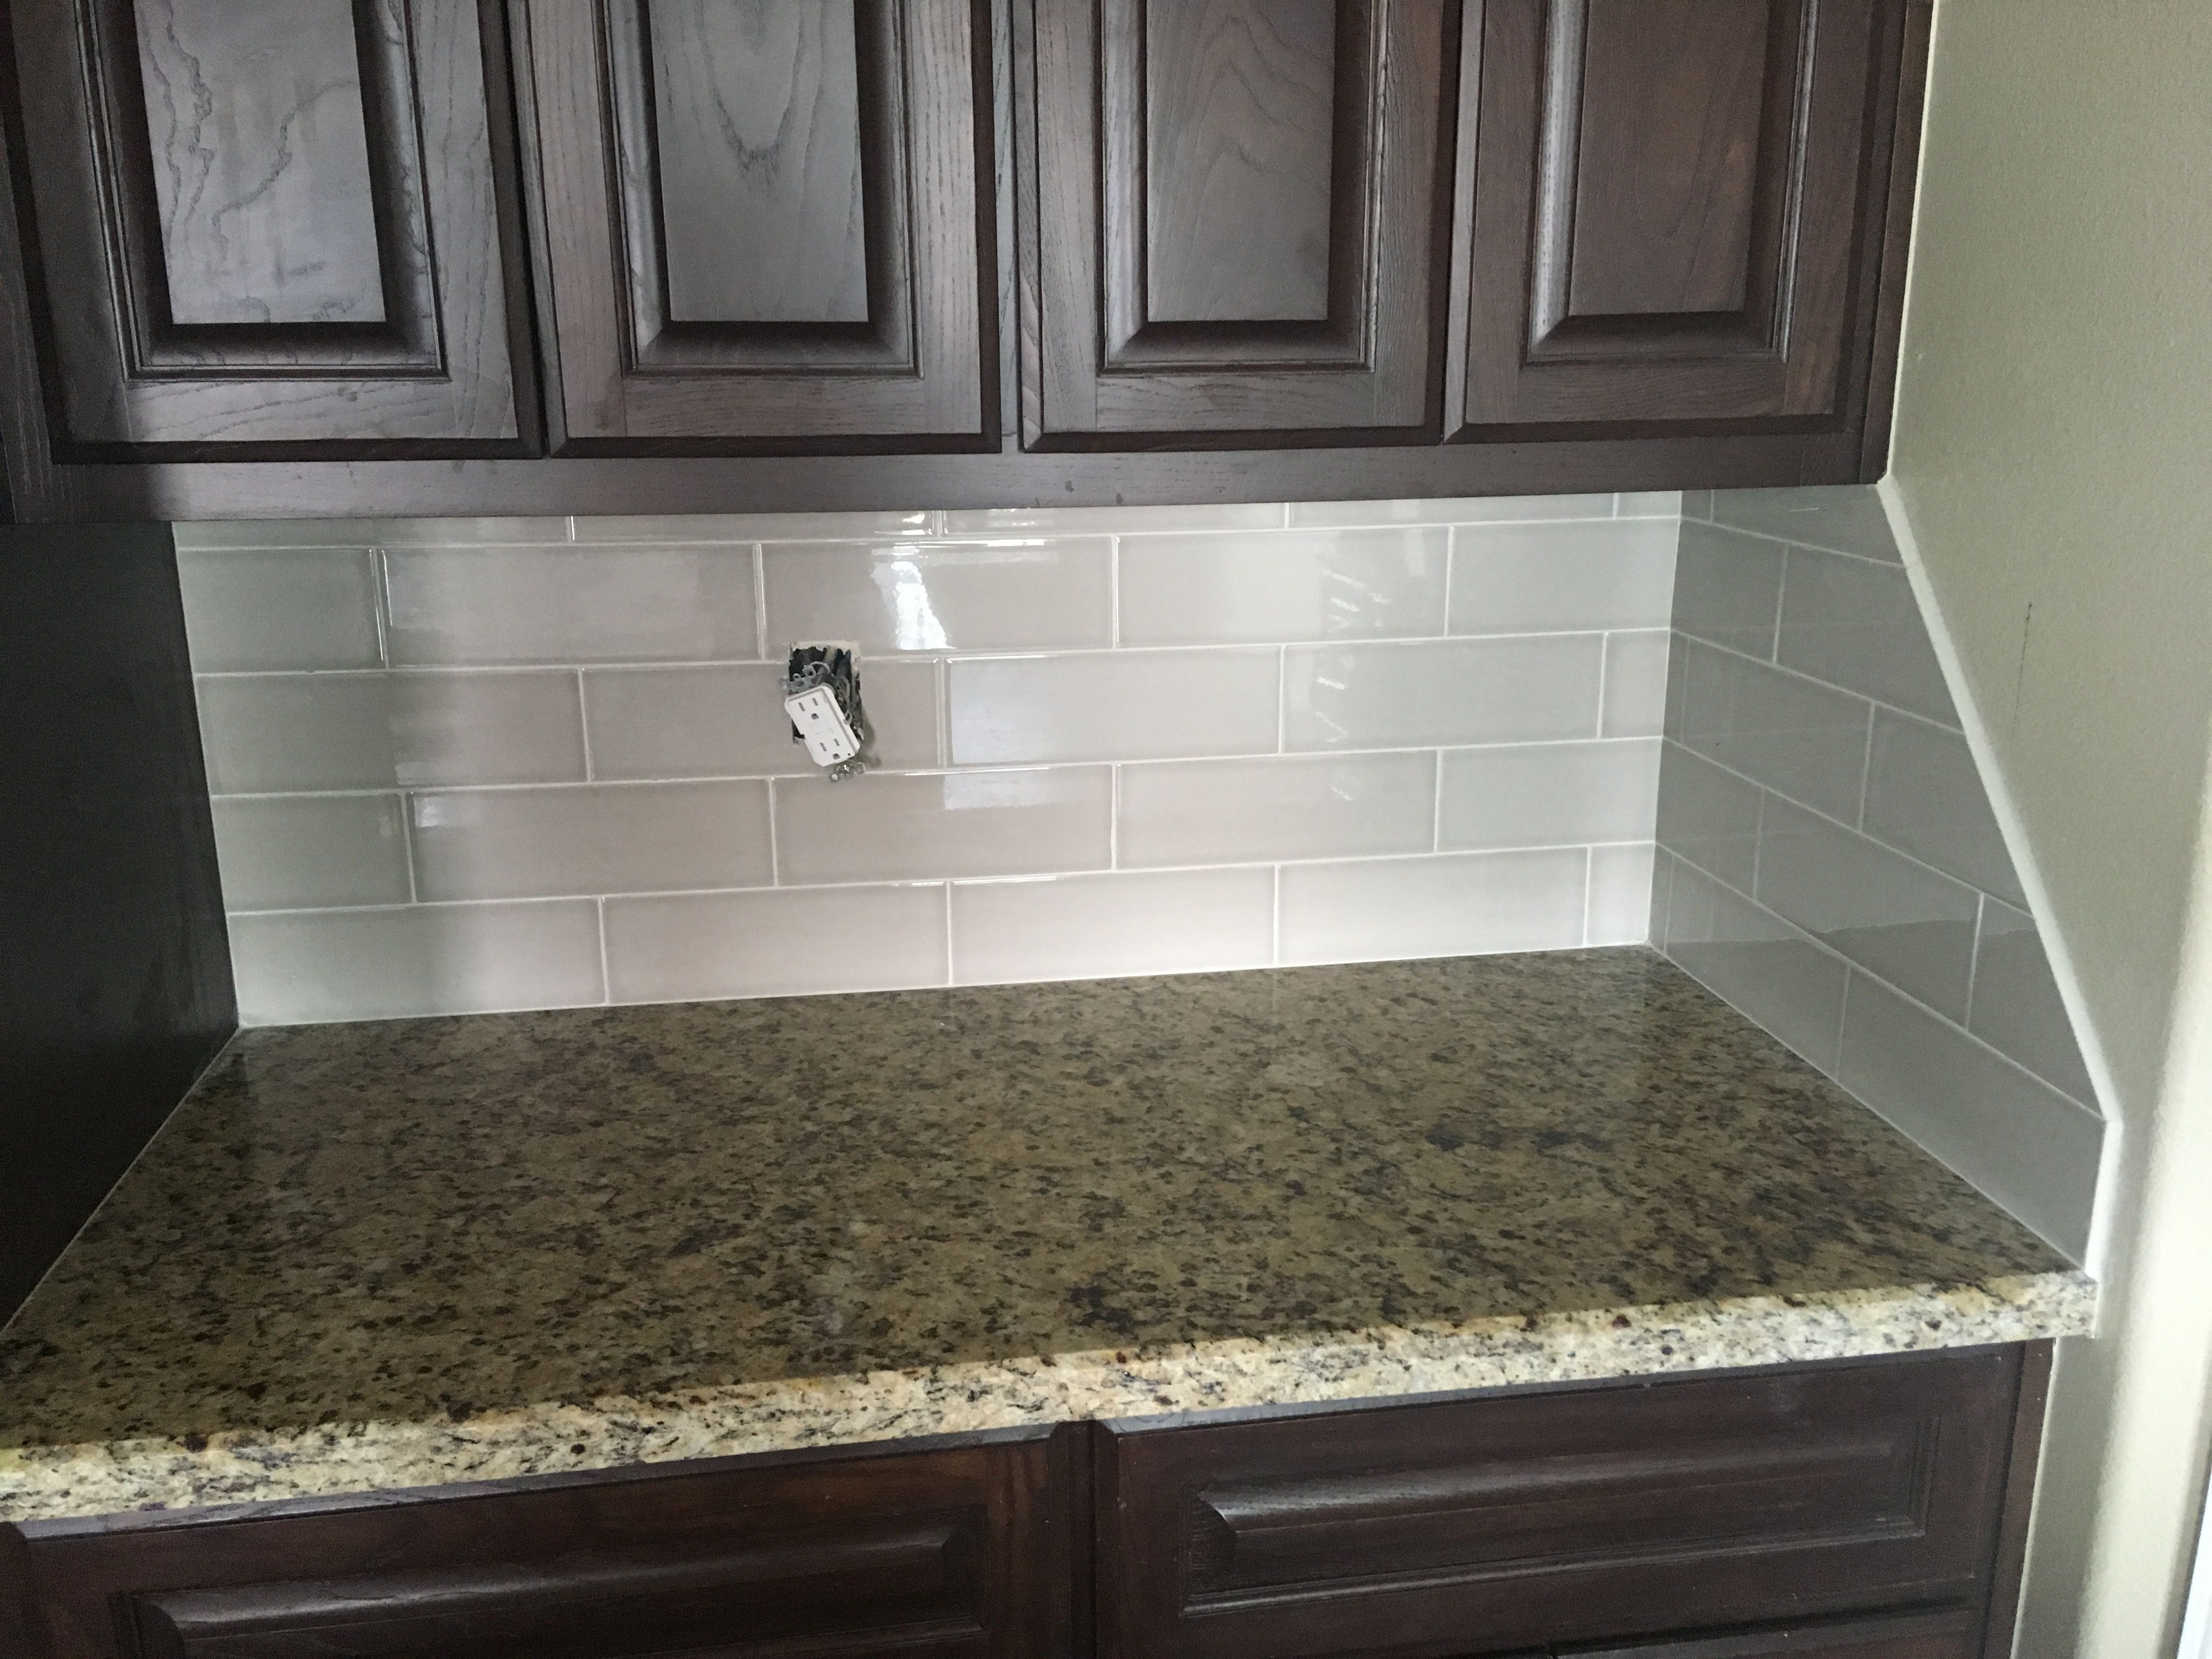 Angled Backsplash Tile Backsplash Glass Backsplash Kitchen